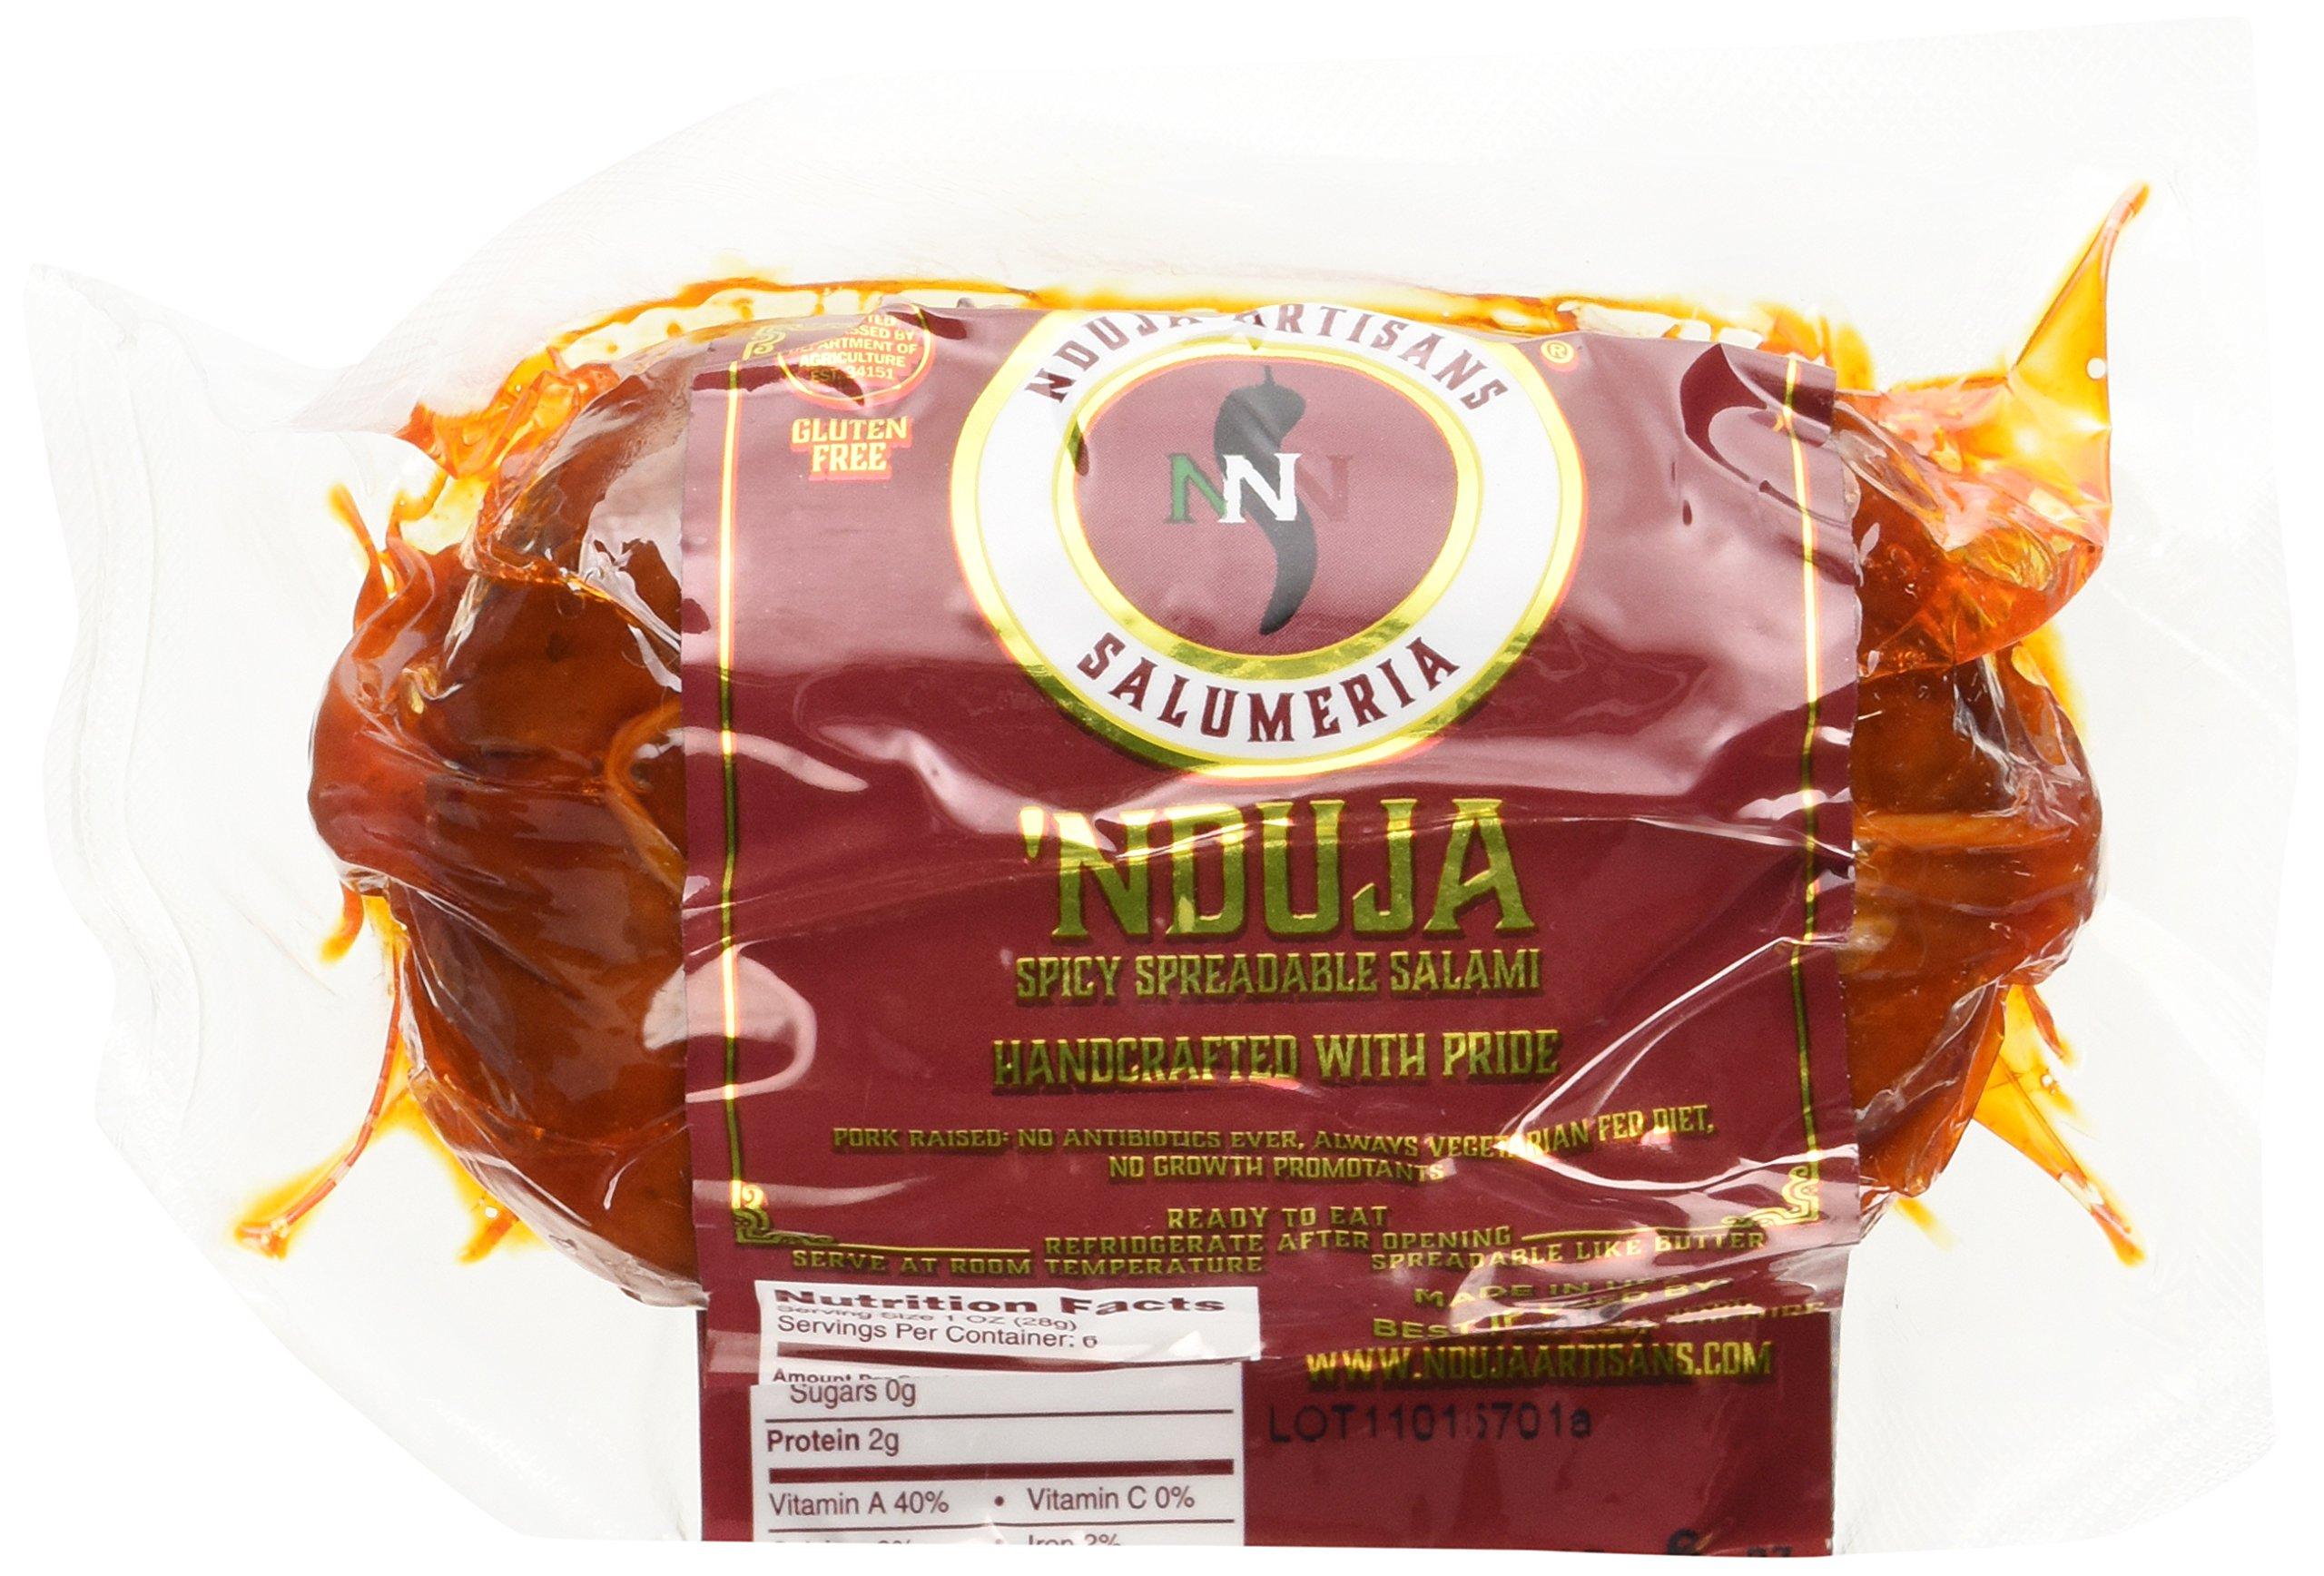 Nduja Artisans Spreadable Salami Spicy, 6 OZ